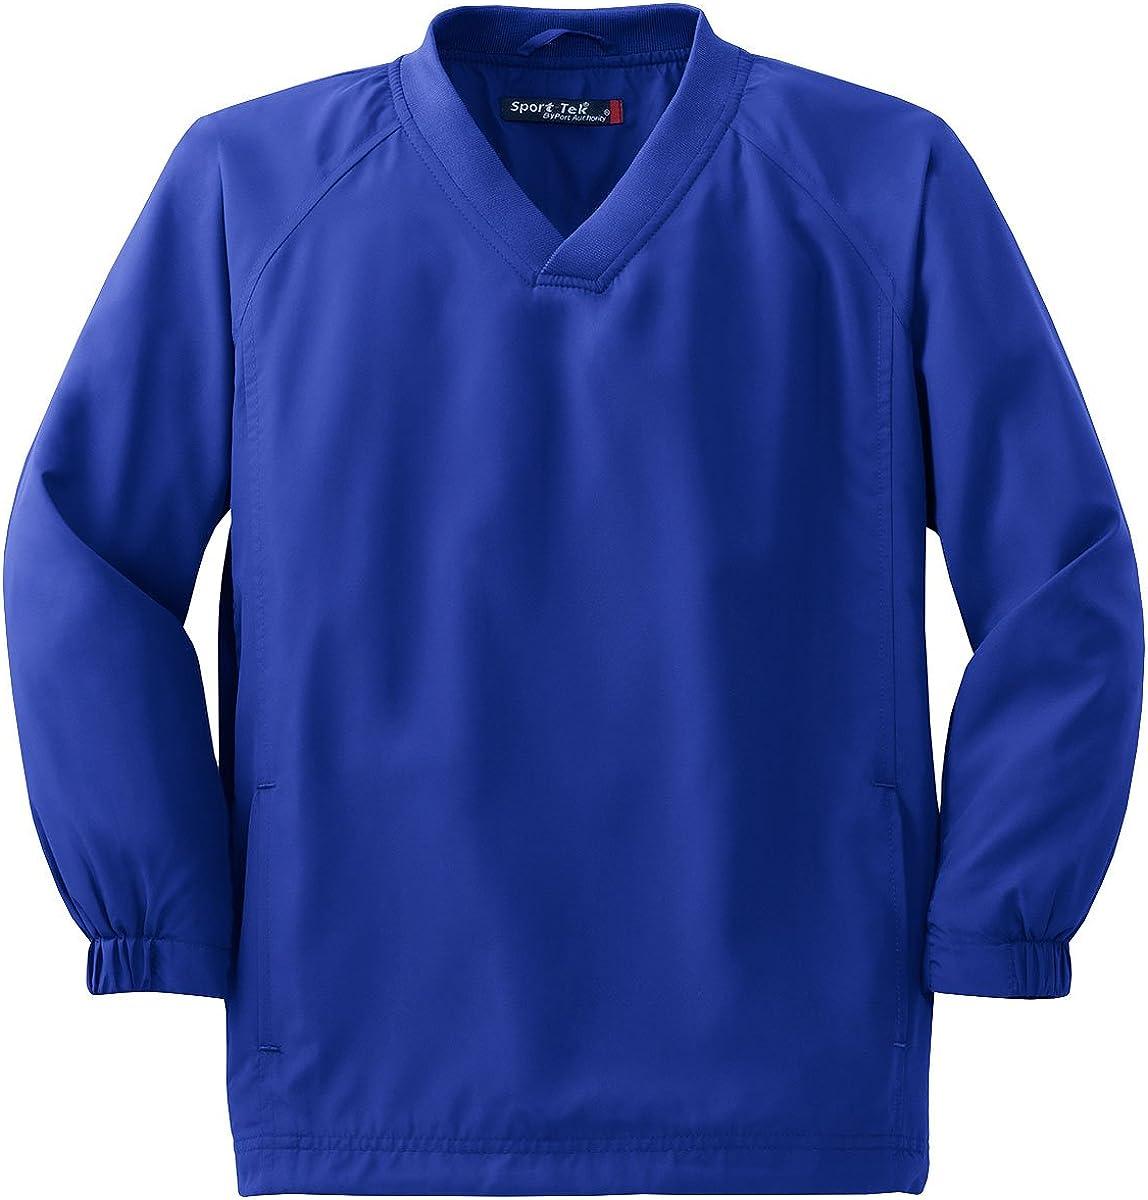 YST72 Youth V-Neck Raglan Wind Shirt True Royal L